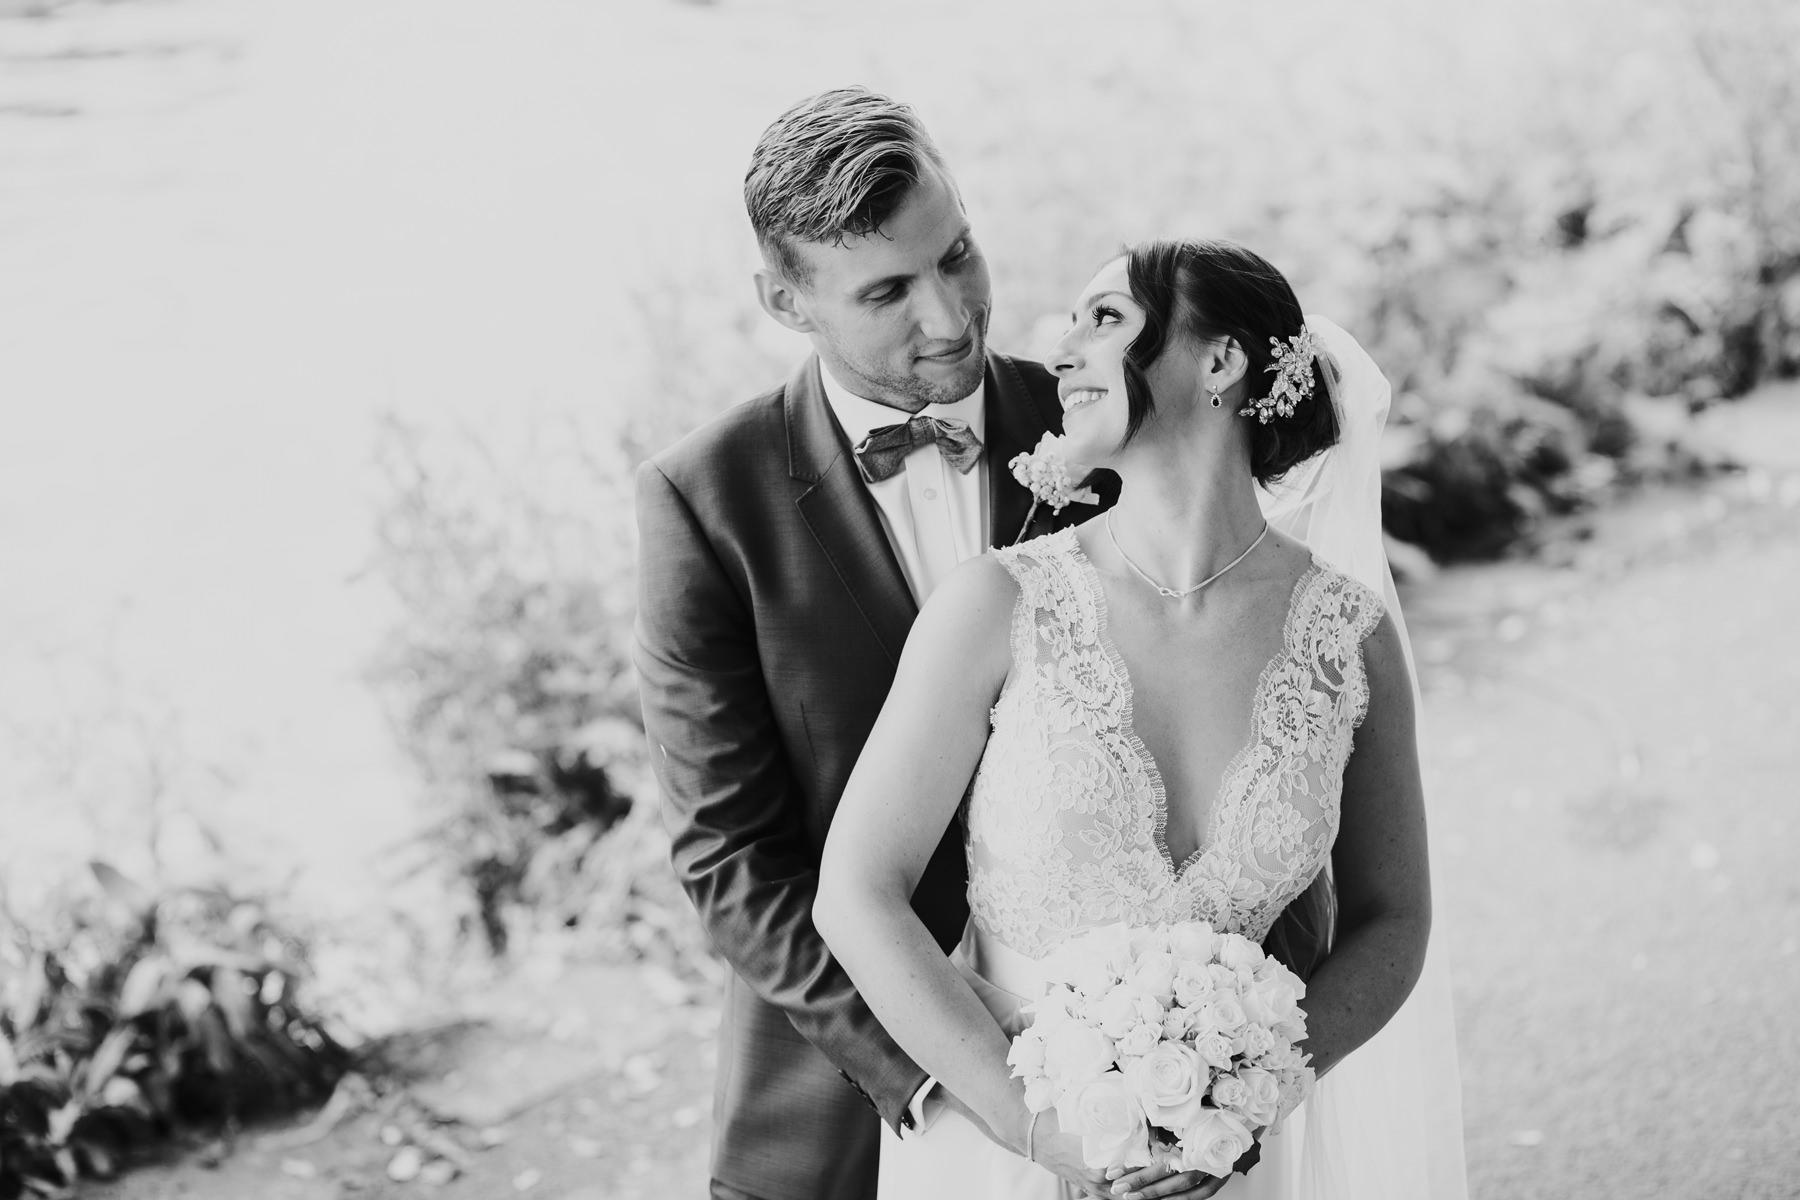 CRL-418-The Bingham wedding Richmond-Claire Rob bridal couple portraits on Thamespath.jpg